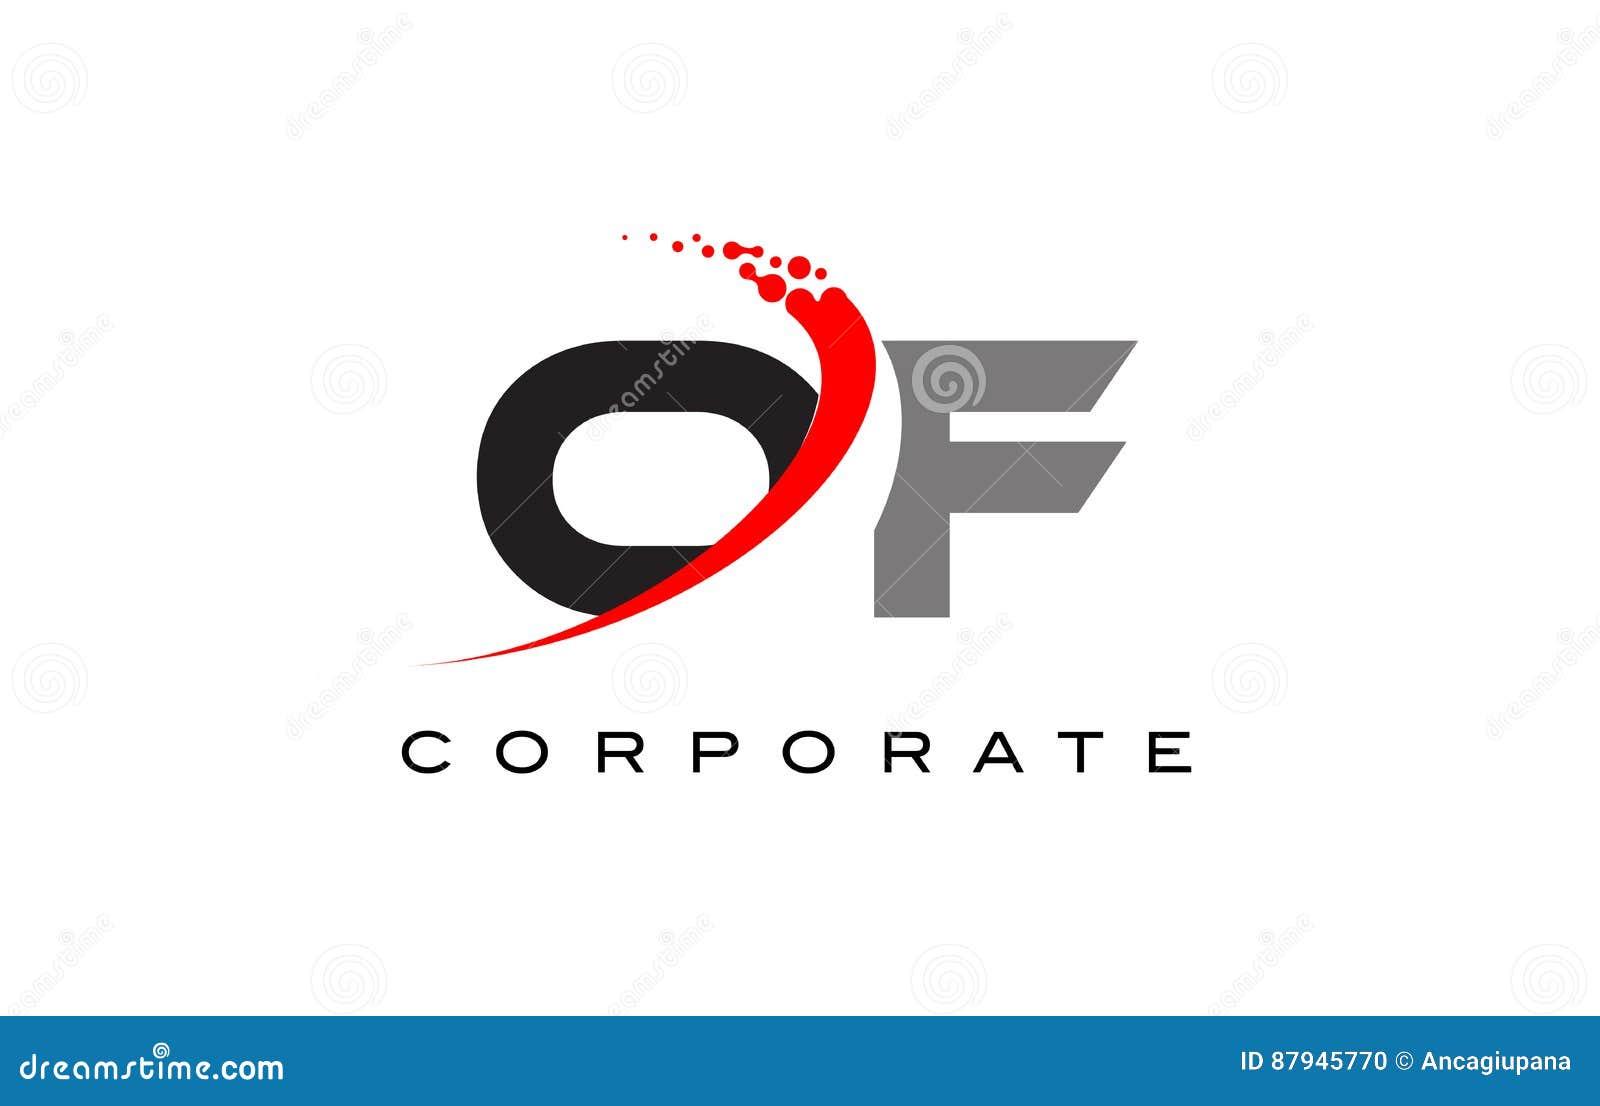 Of Modern Letter Logo Design With Swoosh Stock Vector